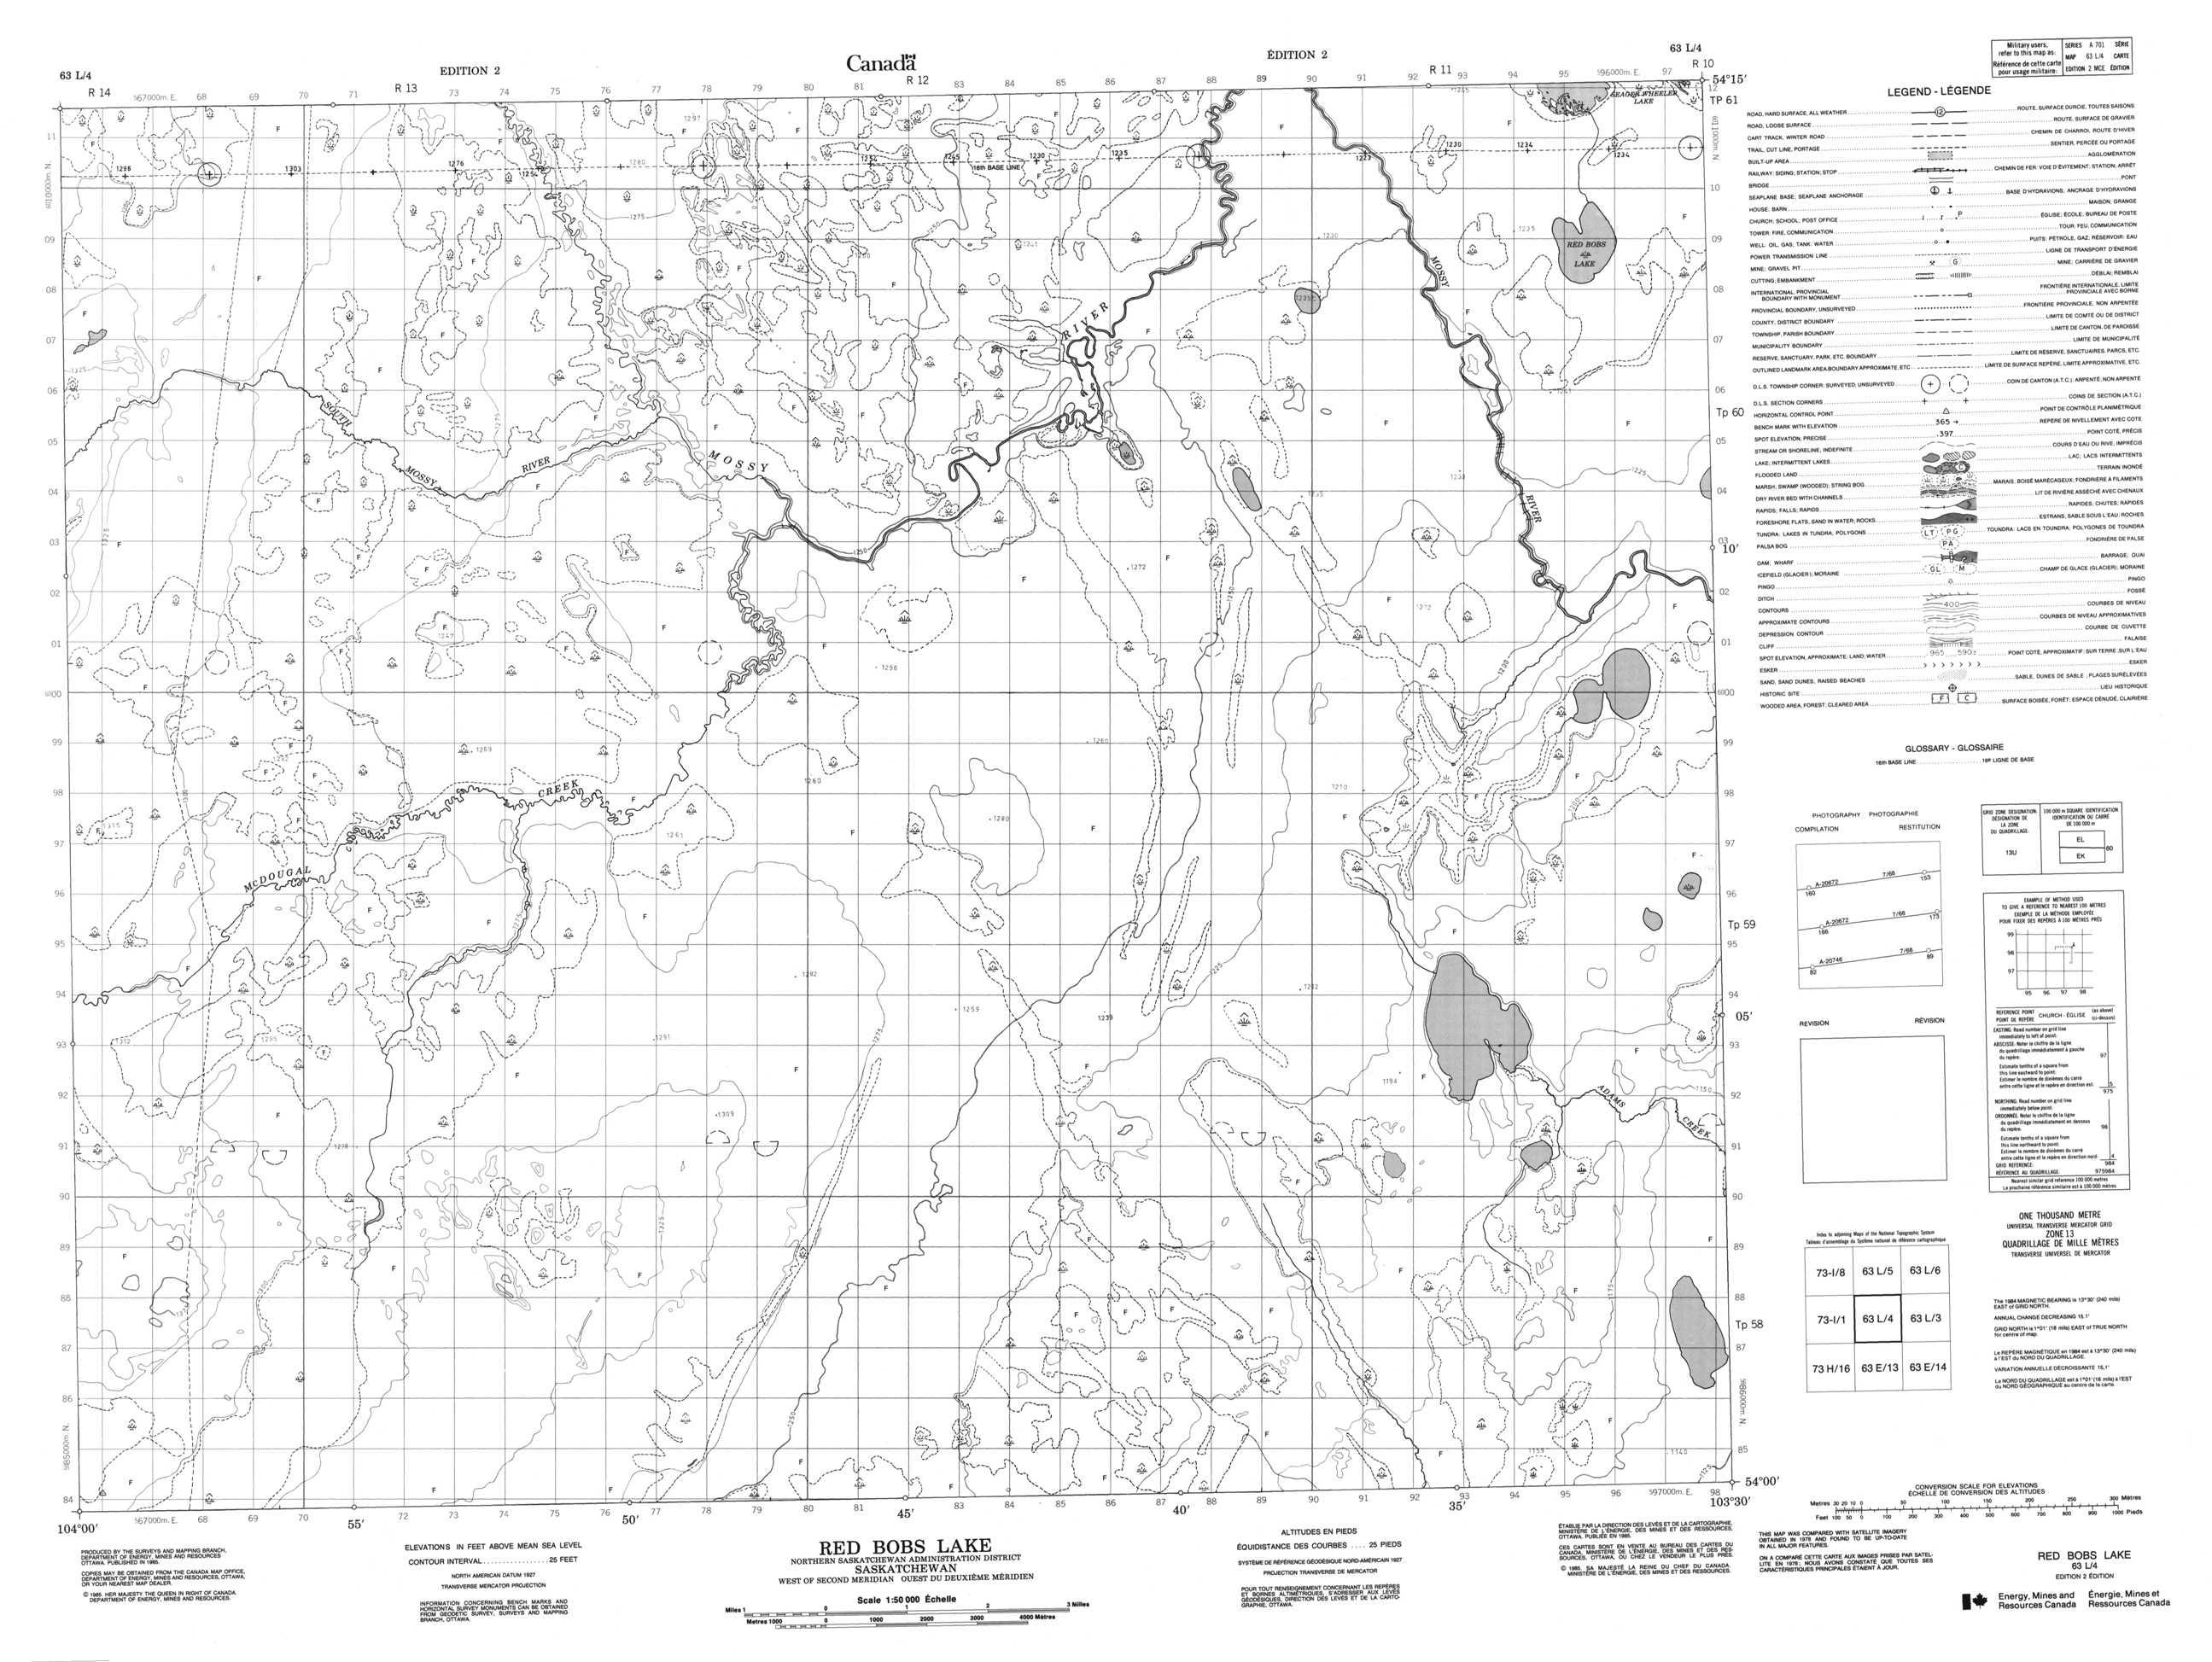 Buy Red Bobs Lake Topographic Map Nts Sheet 063l04 At 1